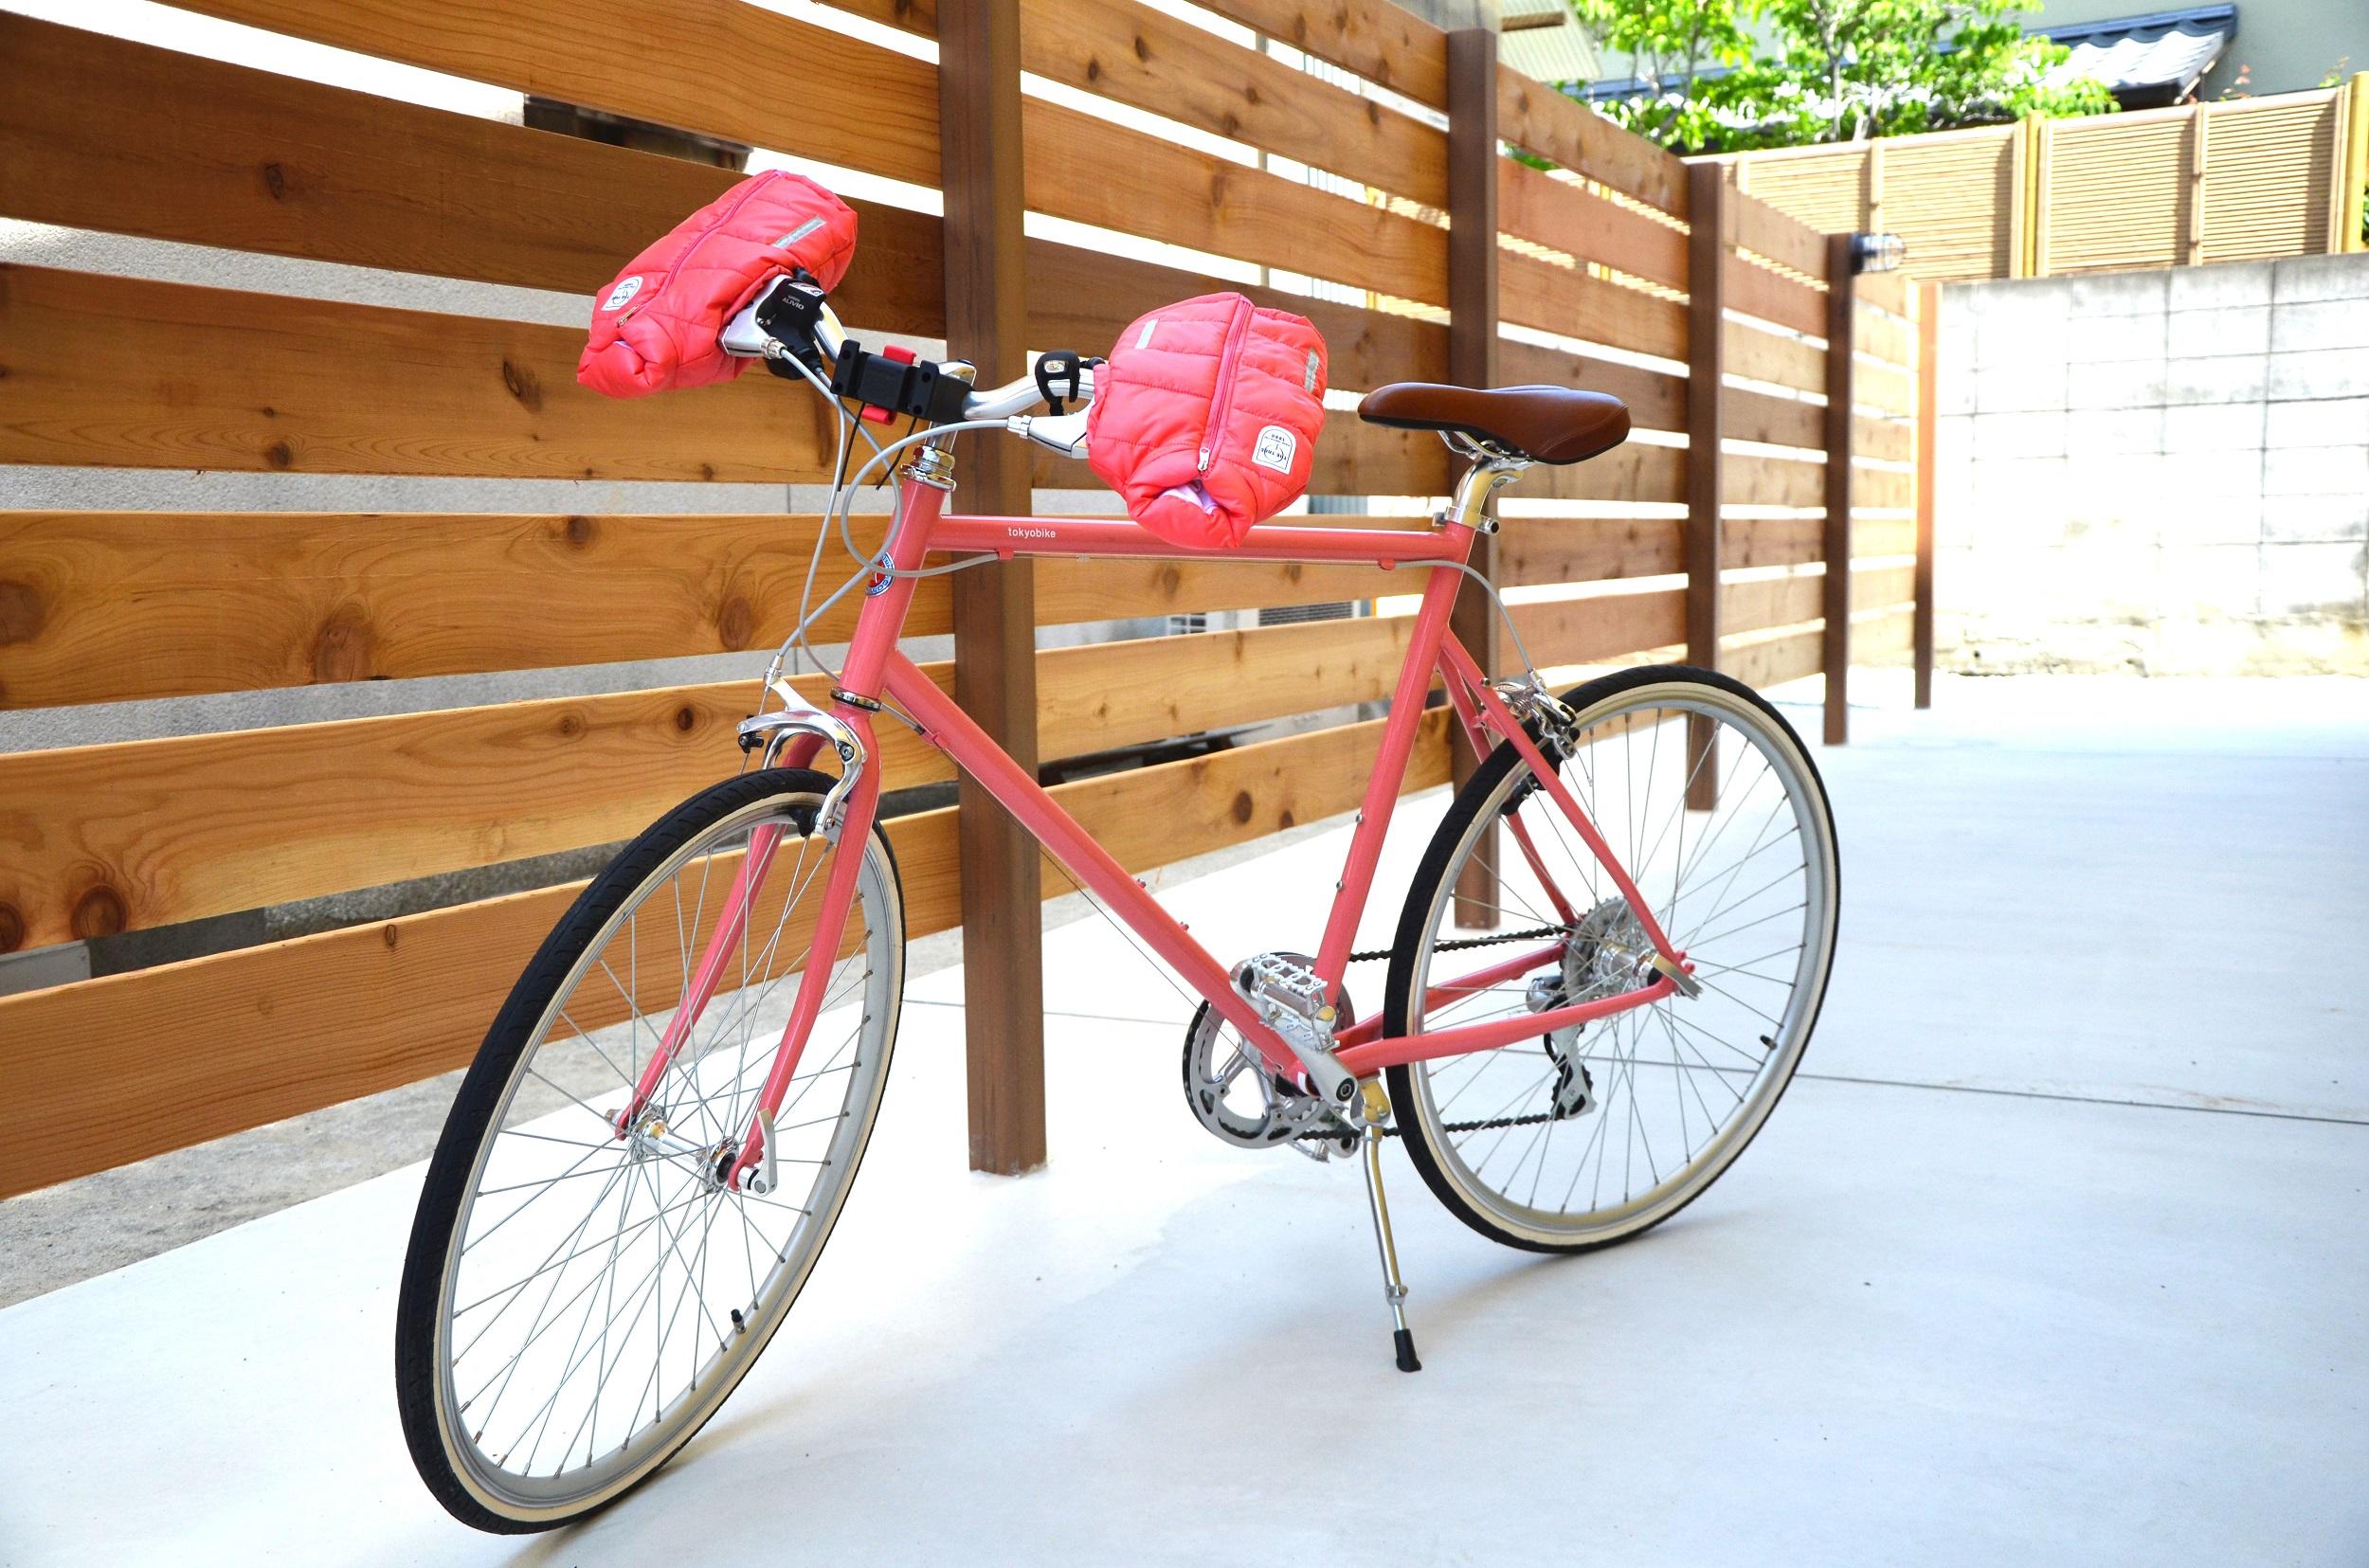 K4100 サイクルジャケット ハンドルカバー クリアブルー